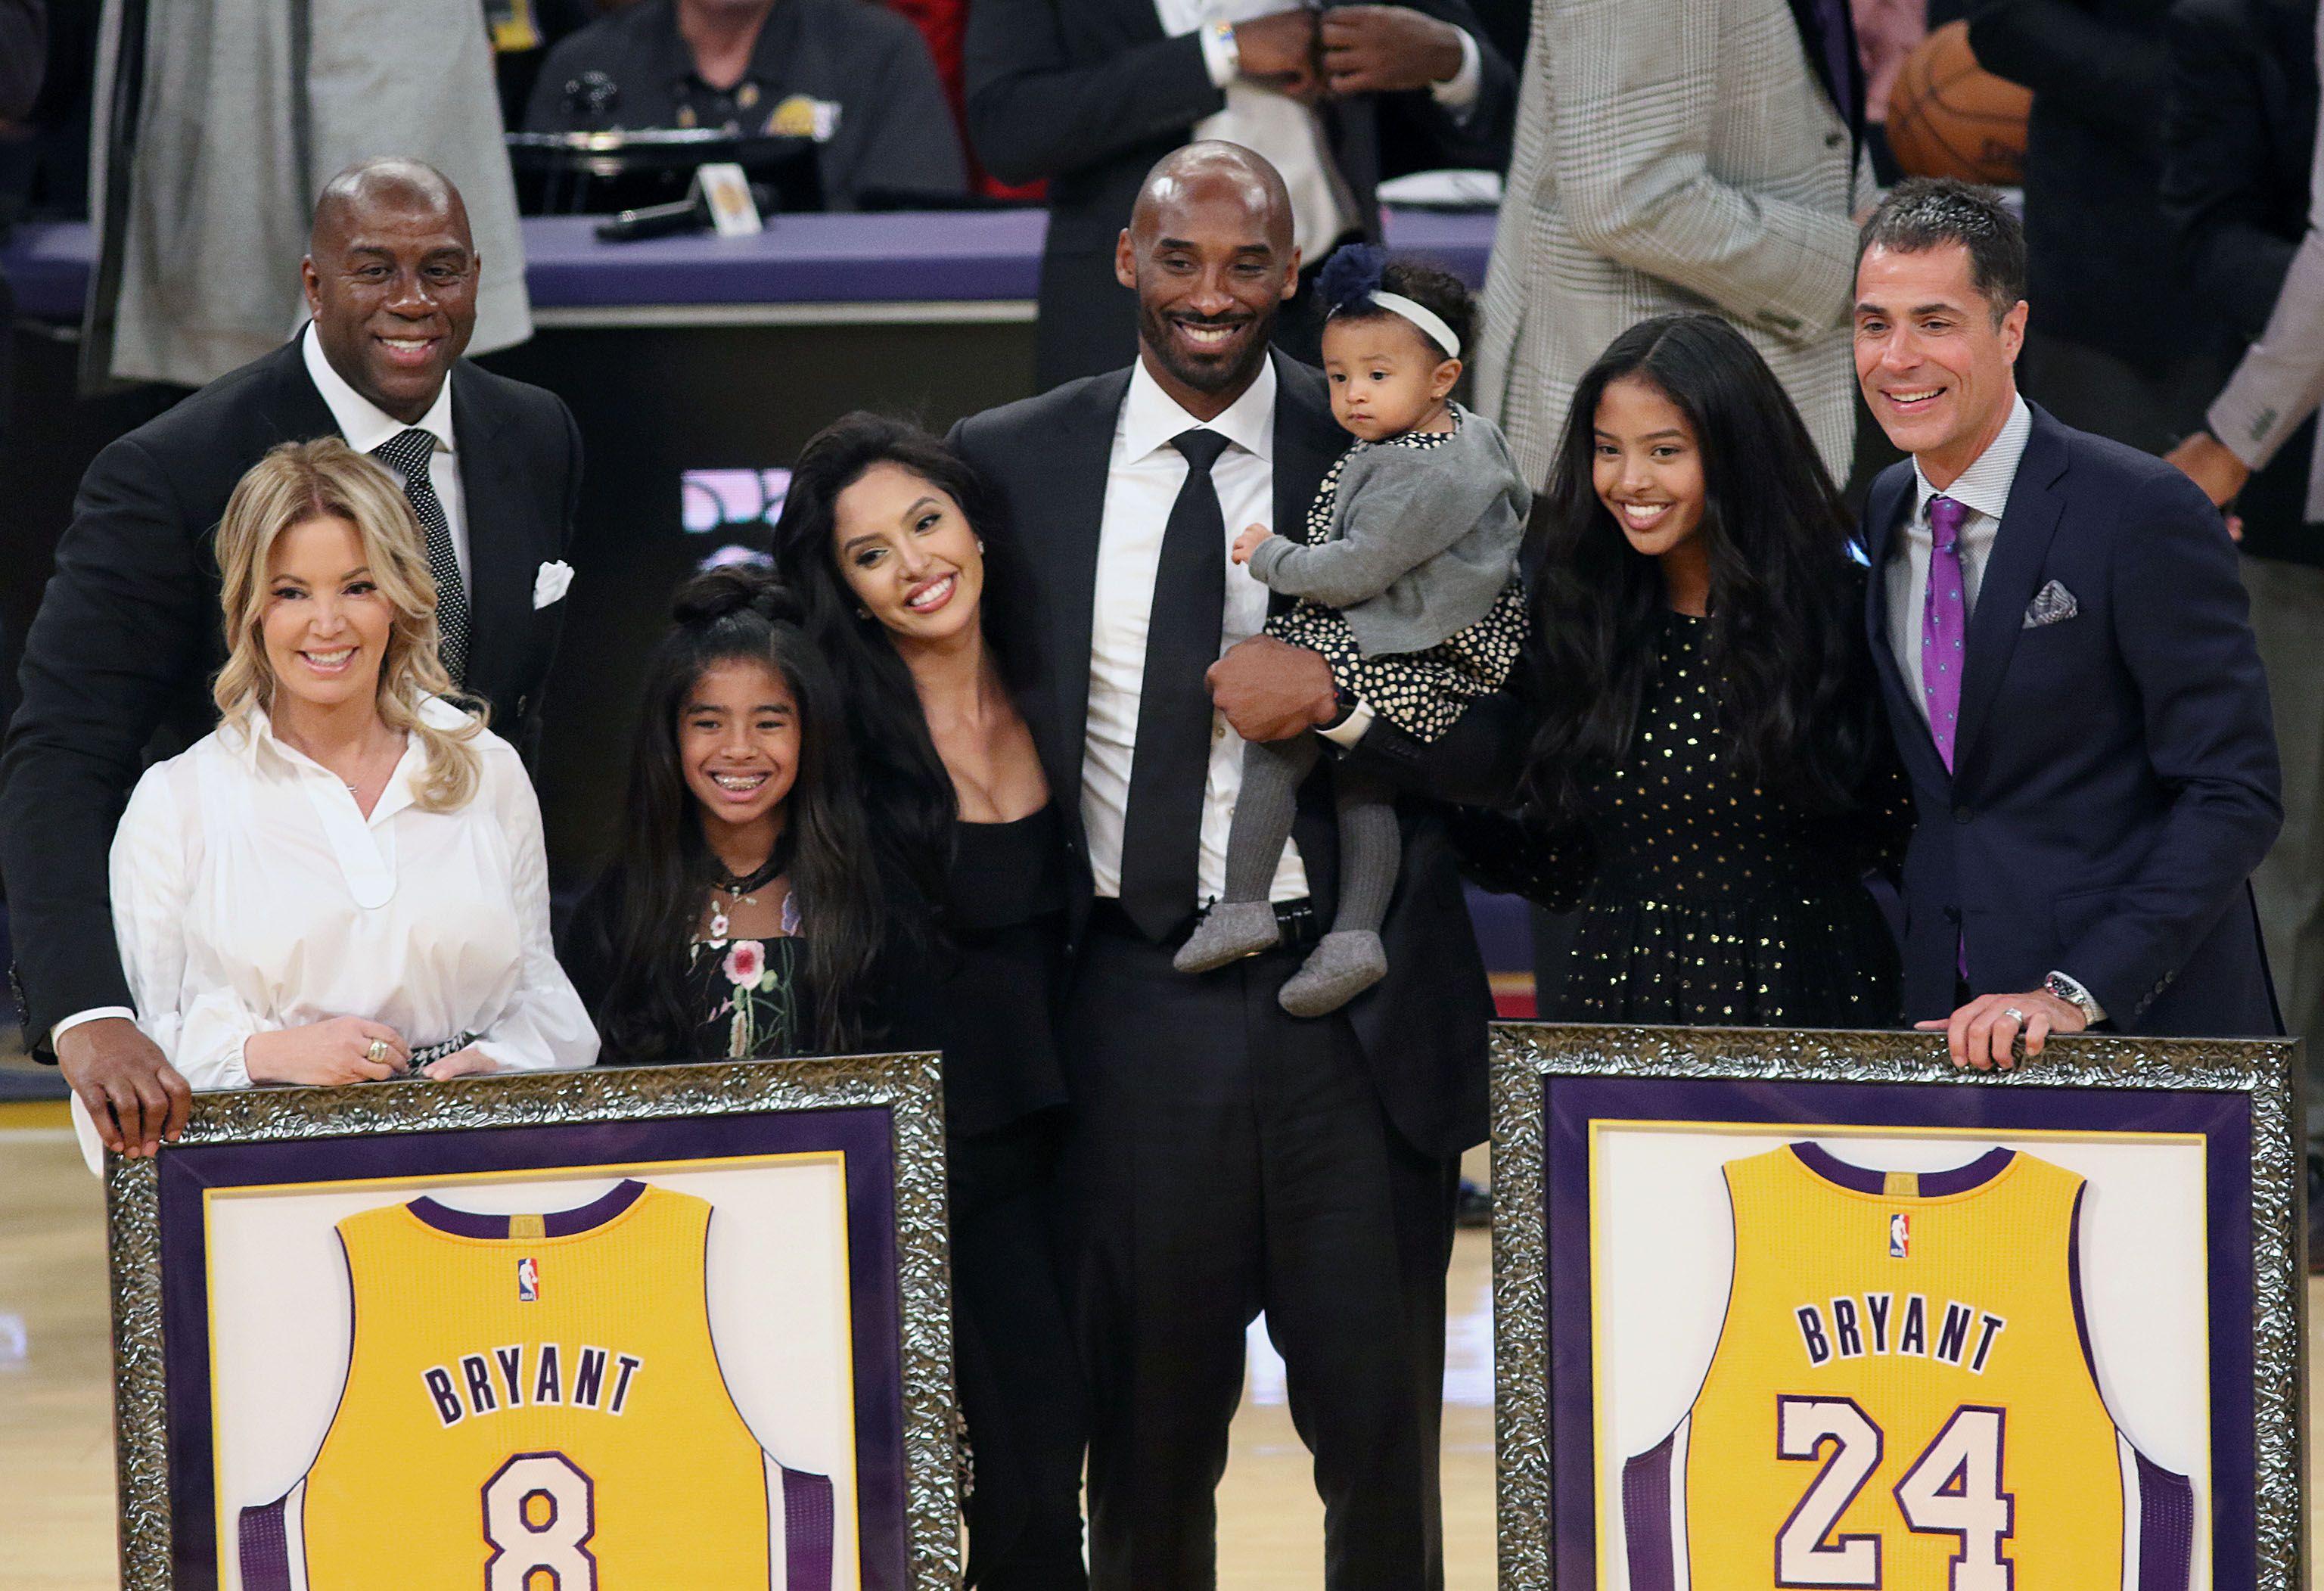 Basket - NBA - Kobe et Gianna Bryant, le rêve américain devenu cauchemar